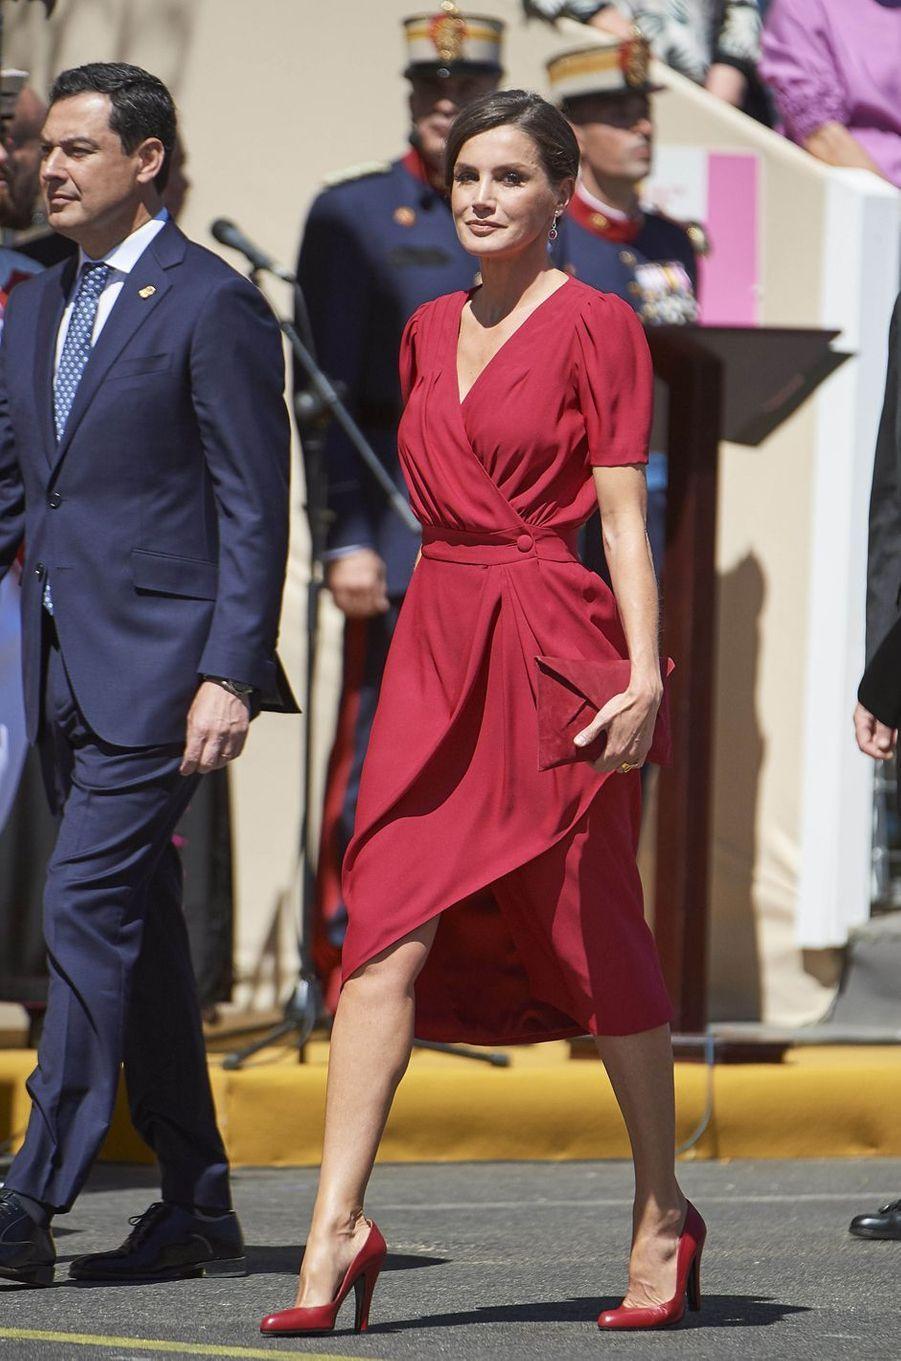 La reine Letizia d'Espagne, dans une robe Cherubina, le 1er juin 2019